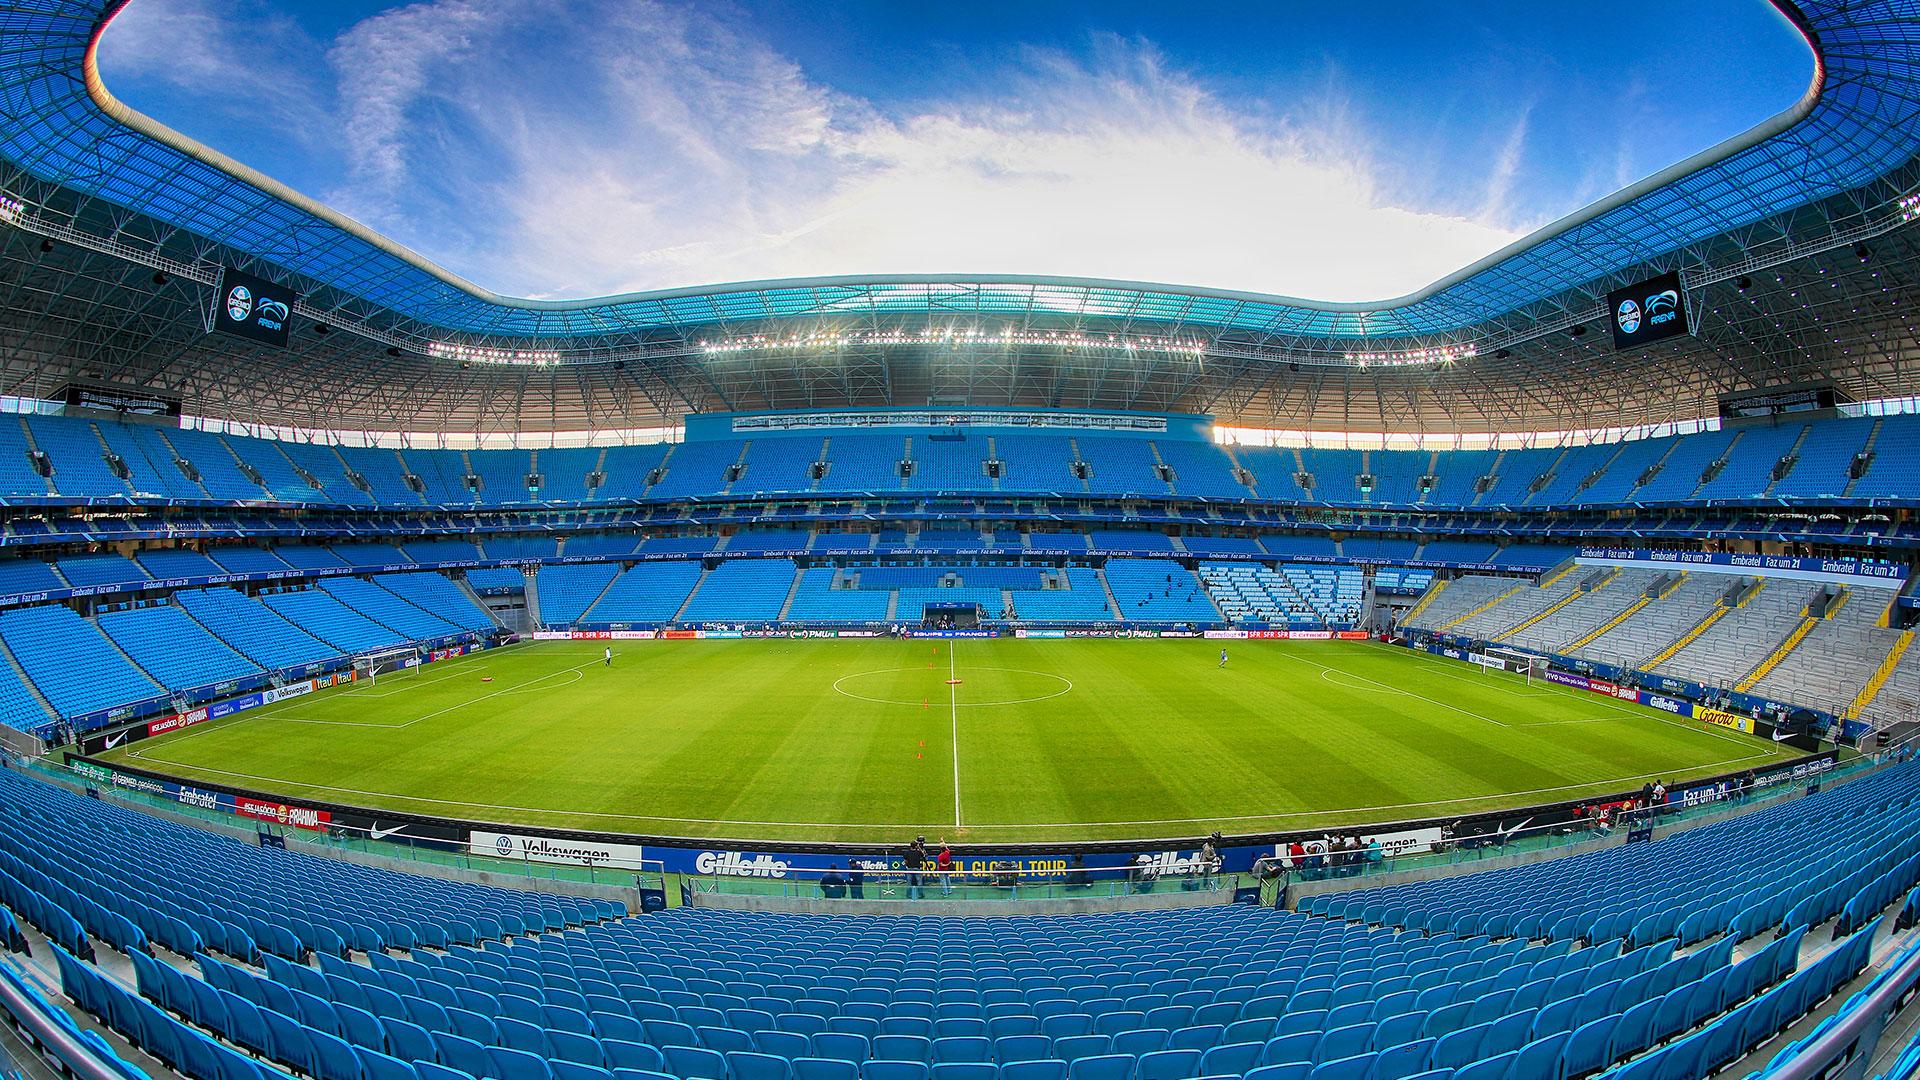 Governo do RS autoriza parcialmente volta de torcedores aos estádios